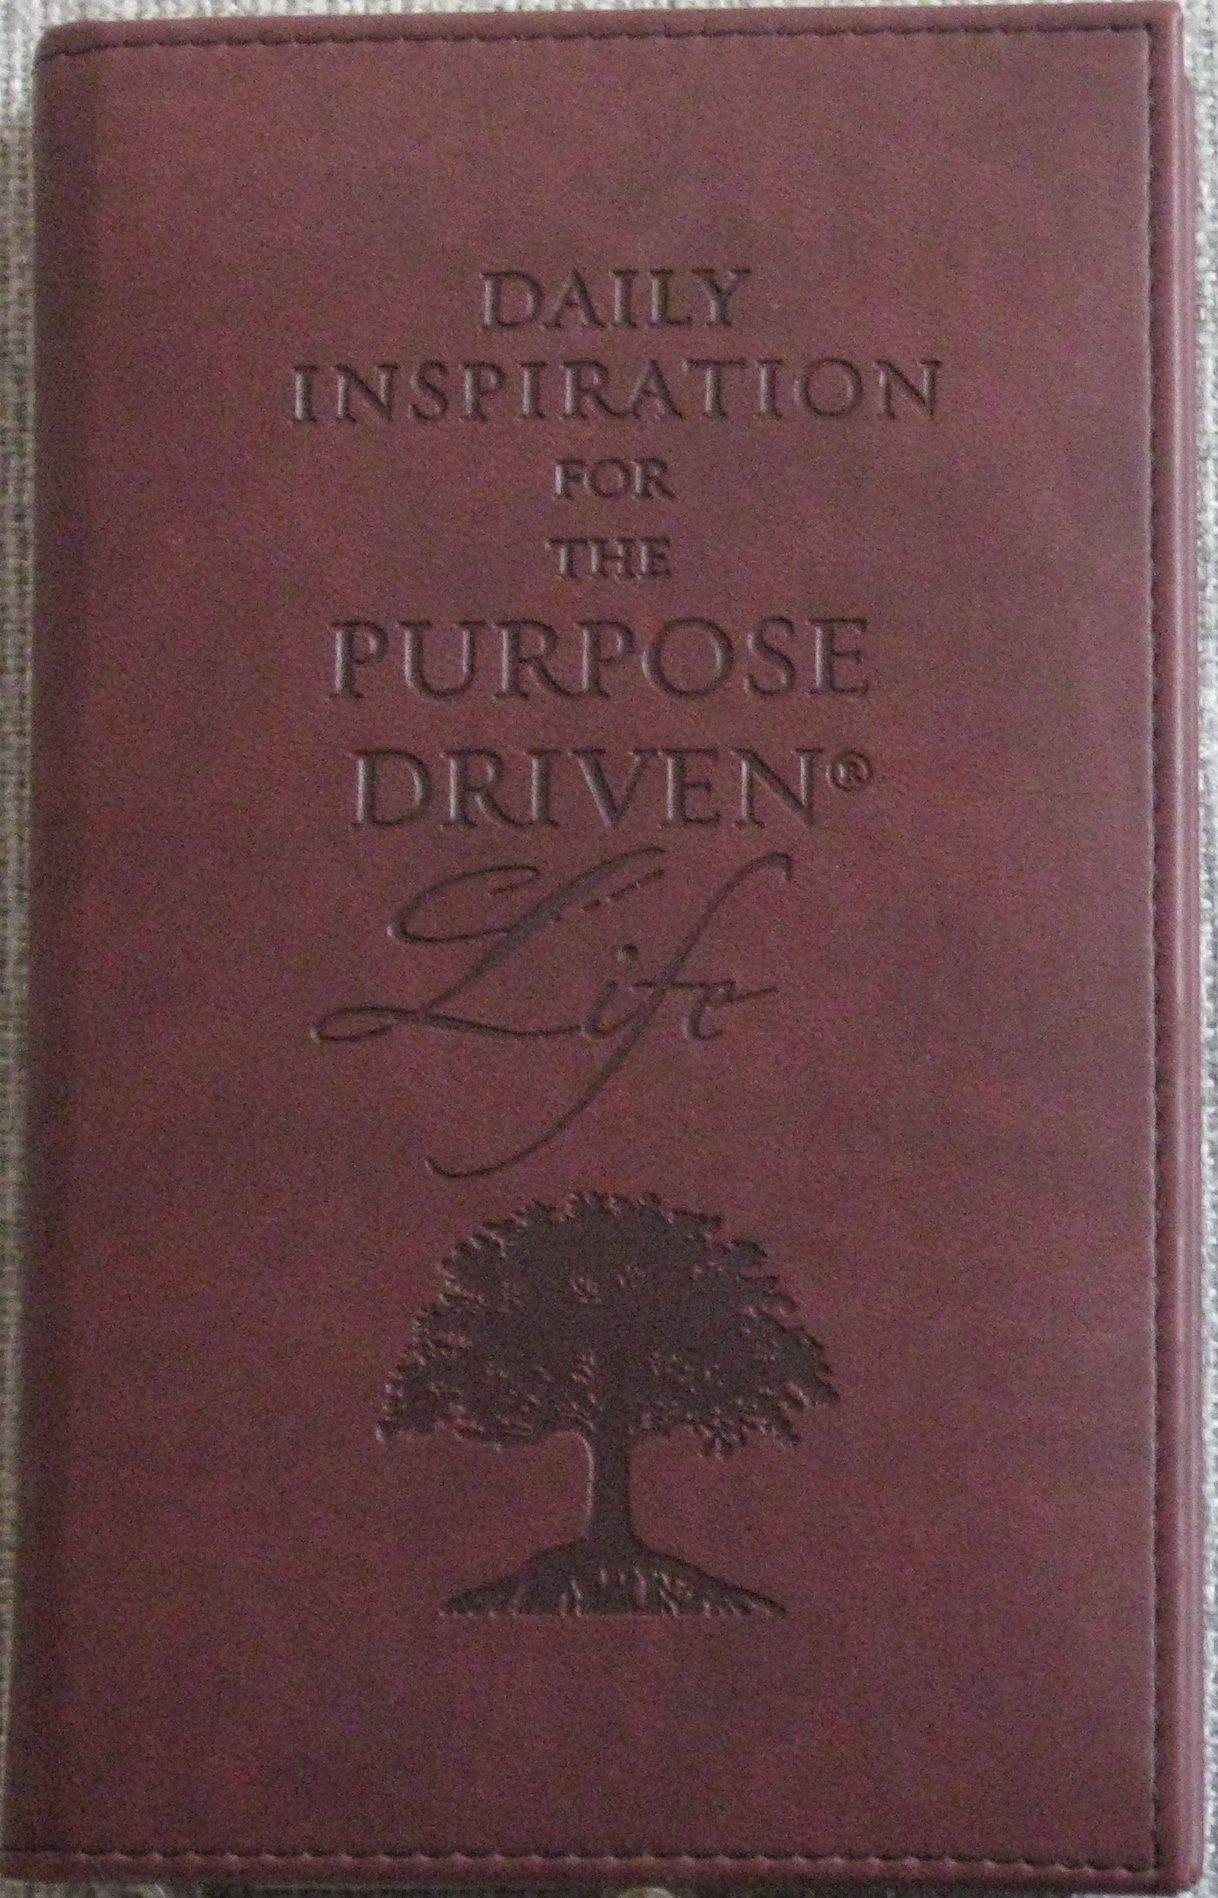 purpose driven life reflection